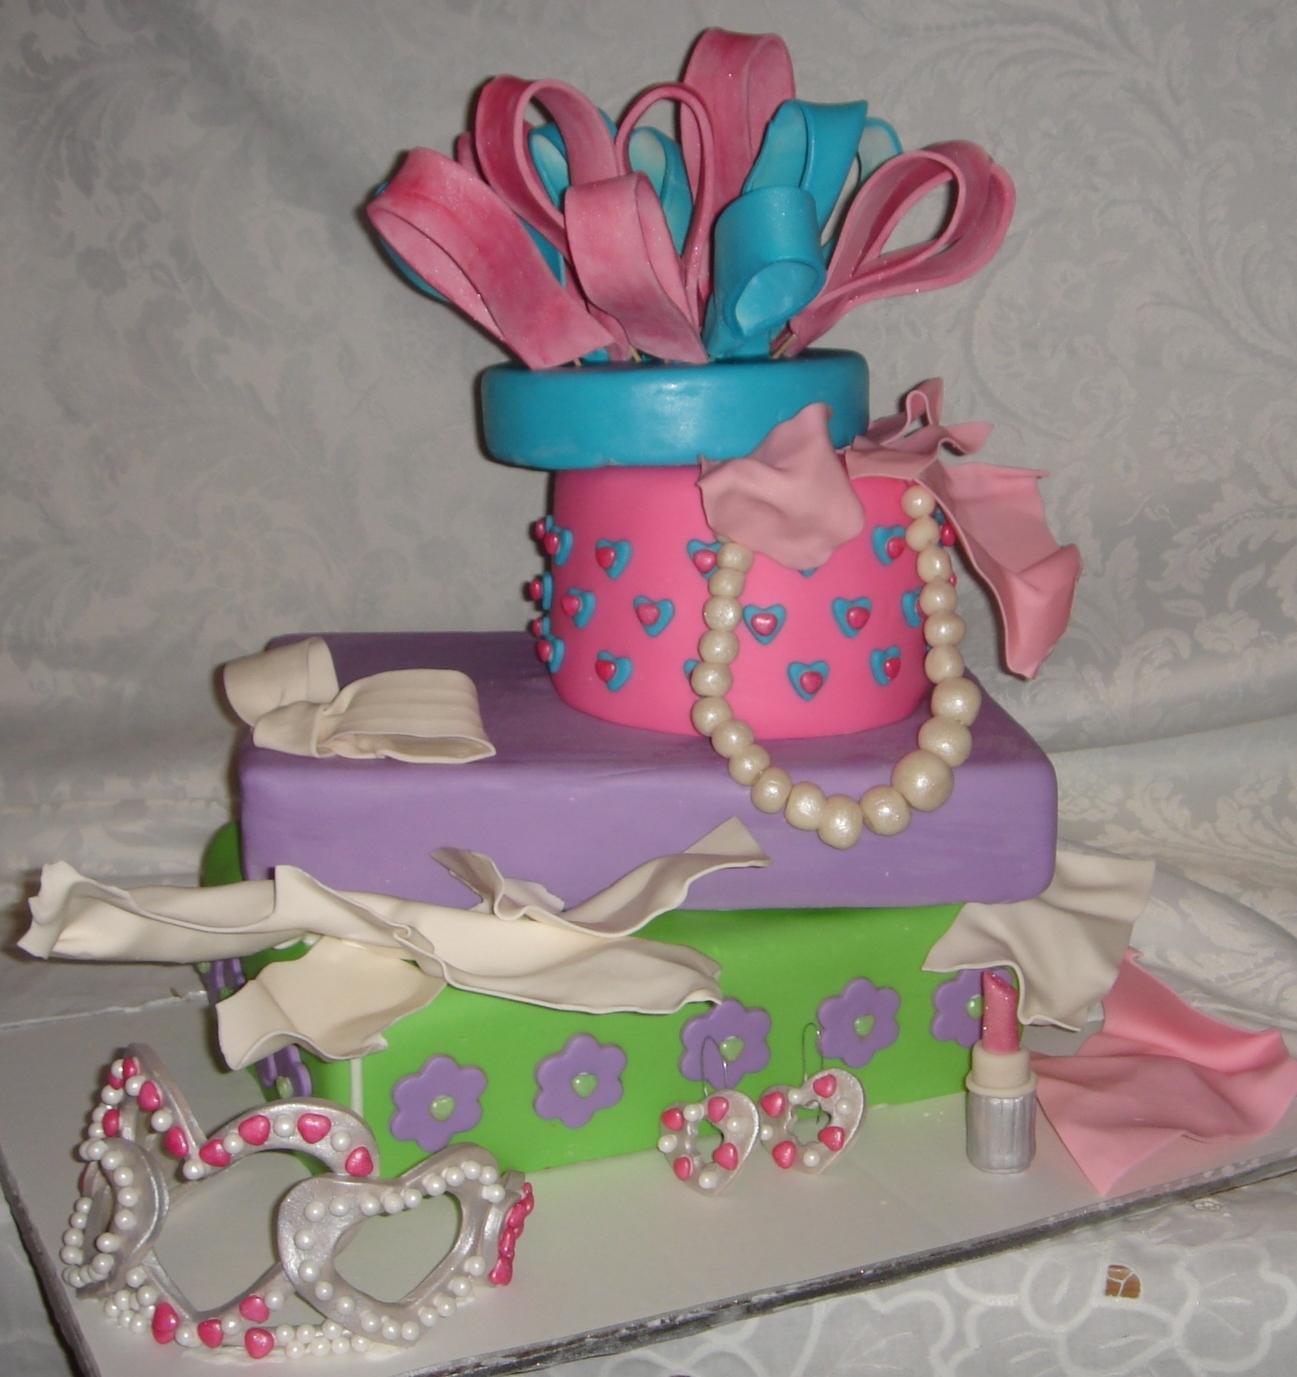 Learn the art of cake decorating arteatsbakery for Art cake decoration